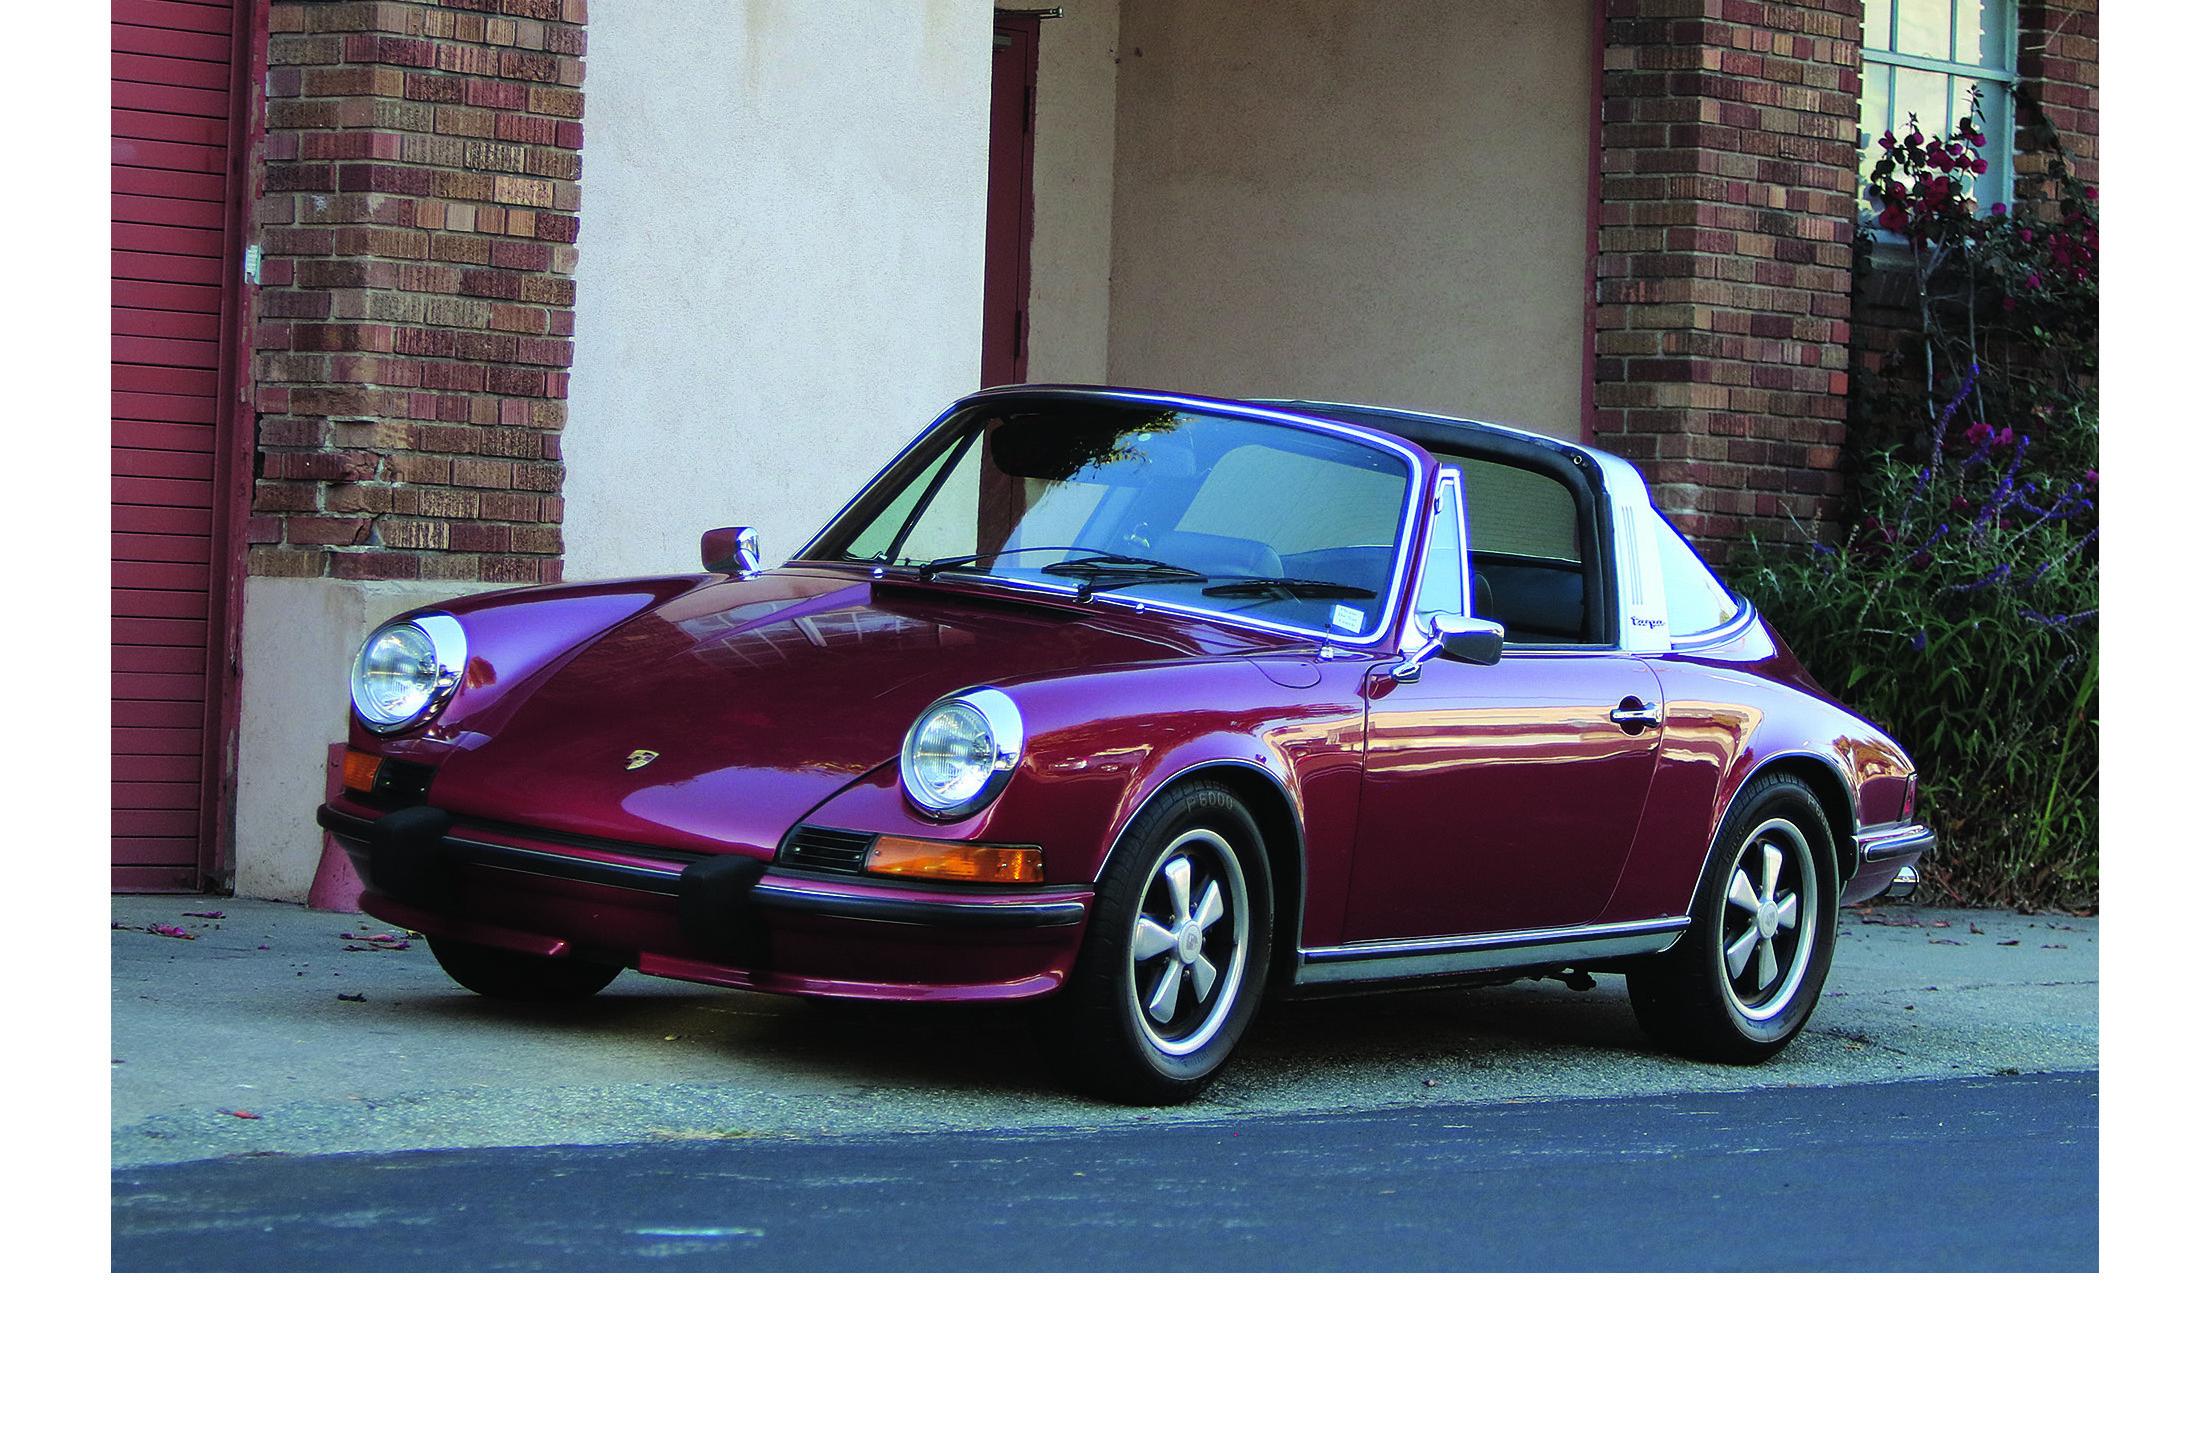 Why Not A Targa Is The Open Top Porsche Todays Best Value